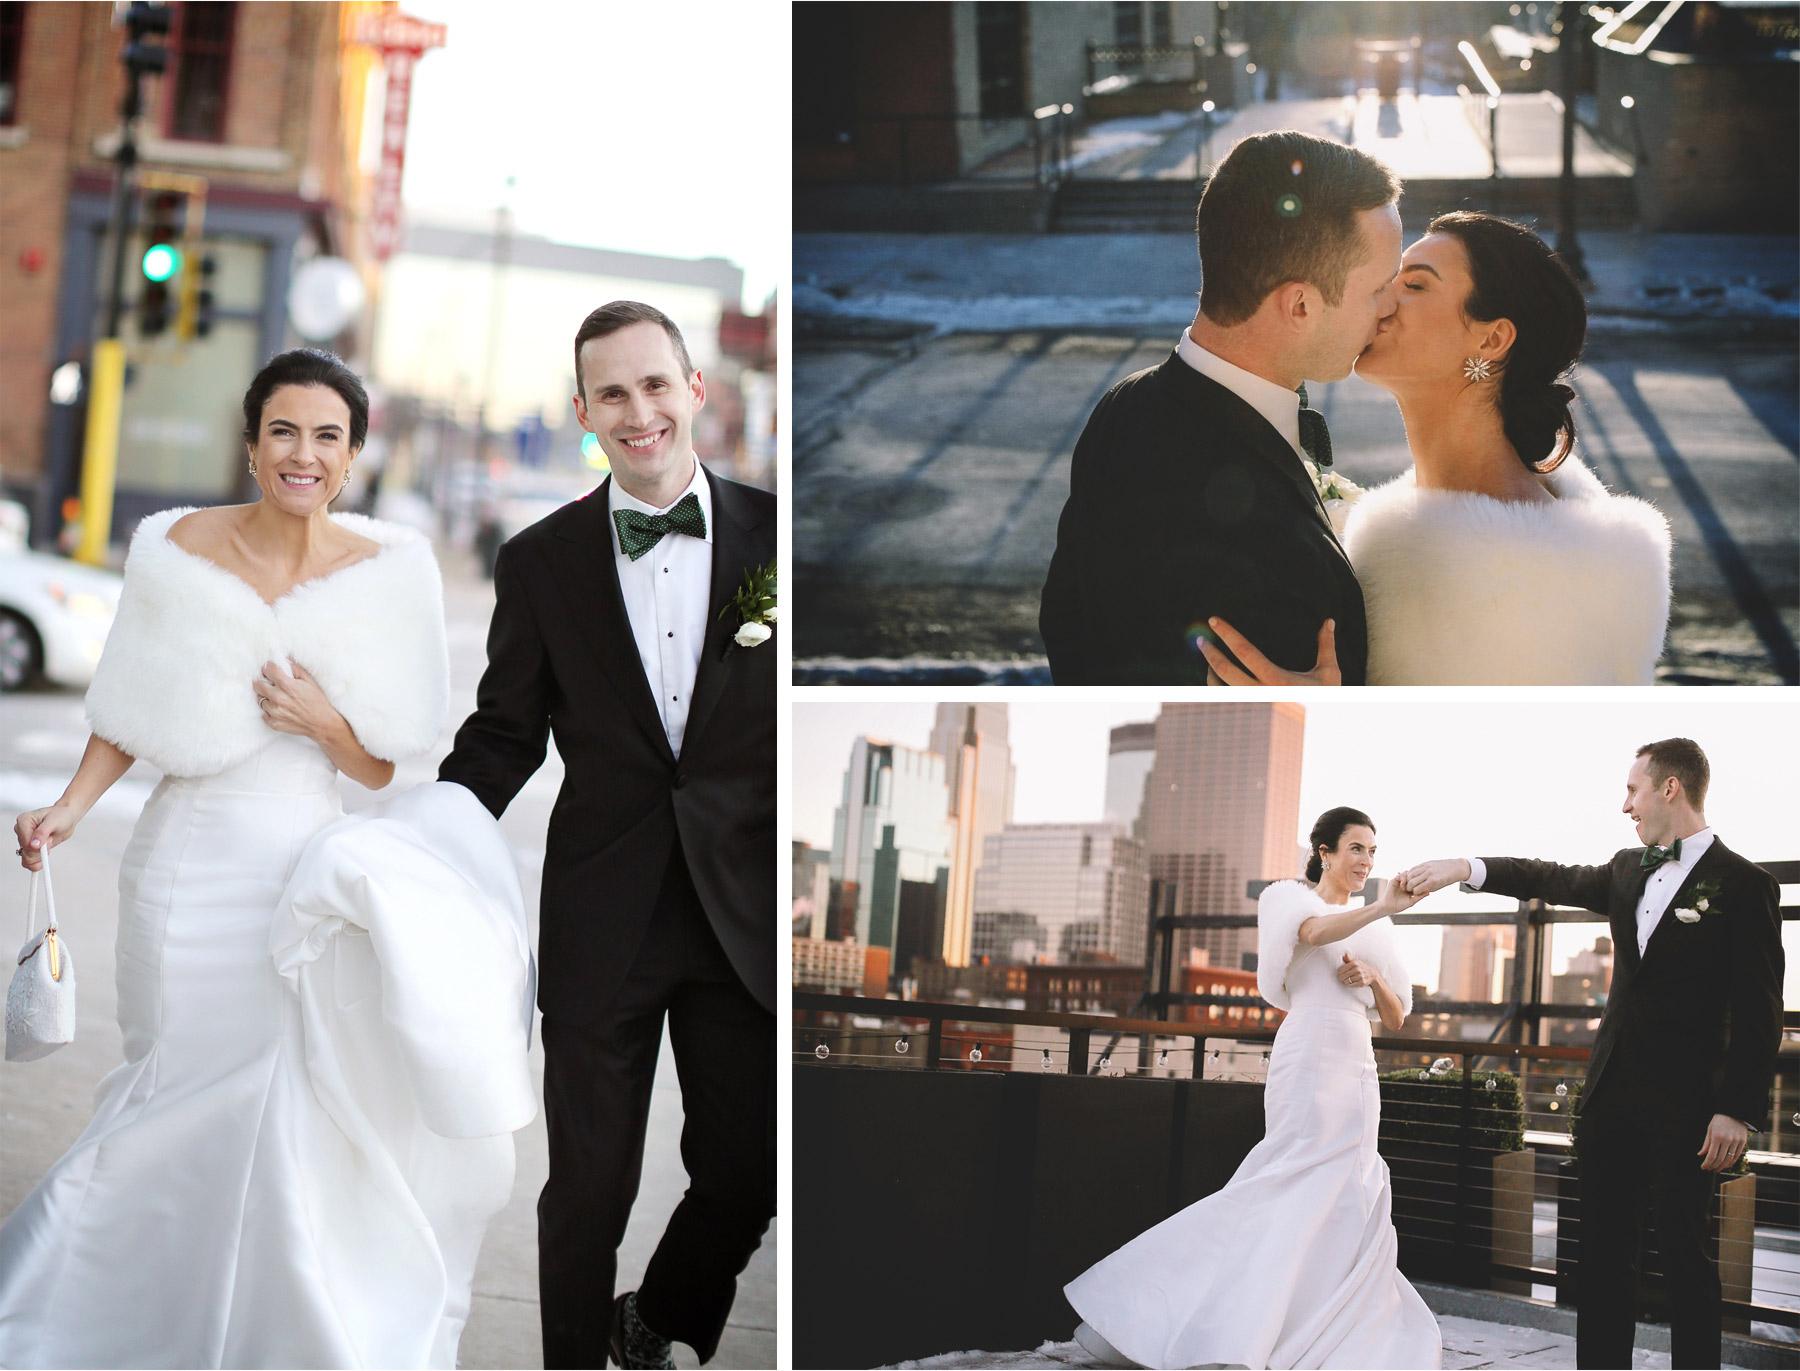 11-Minneapolis-Minnesota-Wedding-Photographer-Andrew-Vick-Photography-Winter-Bride-and-Groom-Downtown-Skyline-Allison-and-Steve.jpg